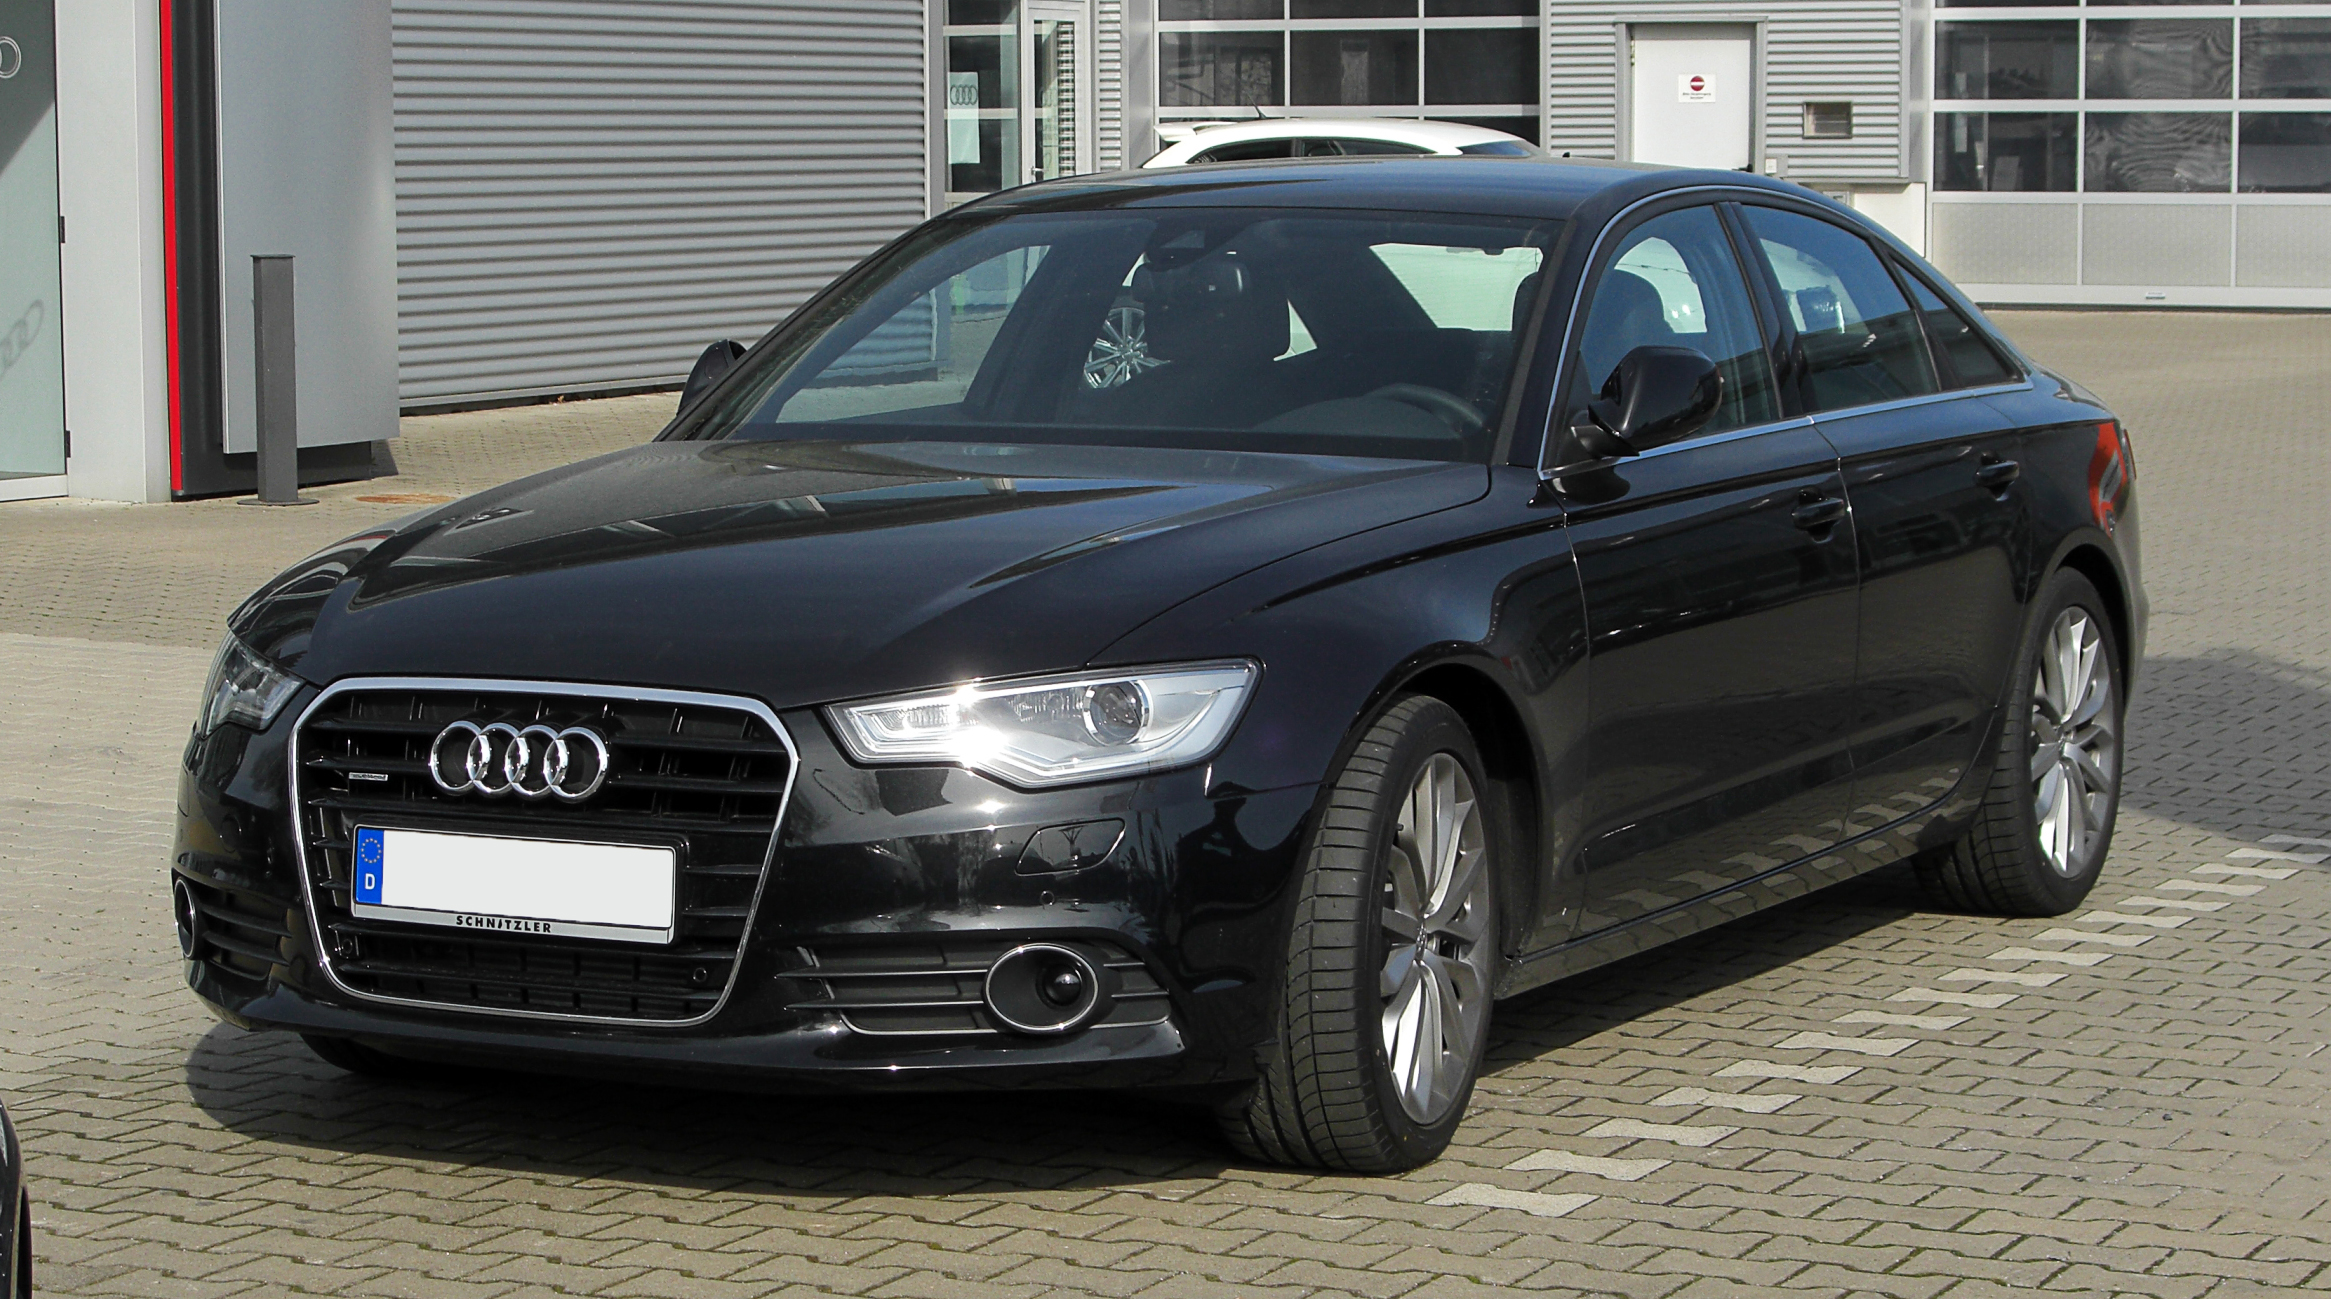 Audi a6 wiki